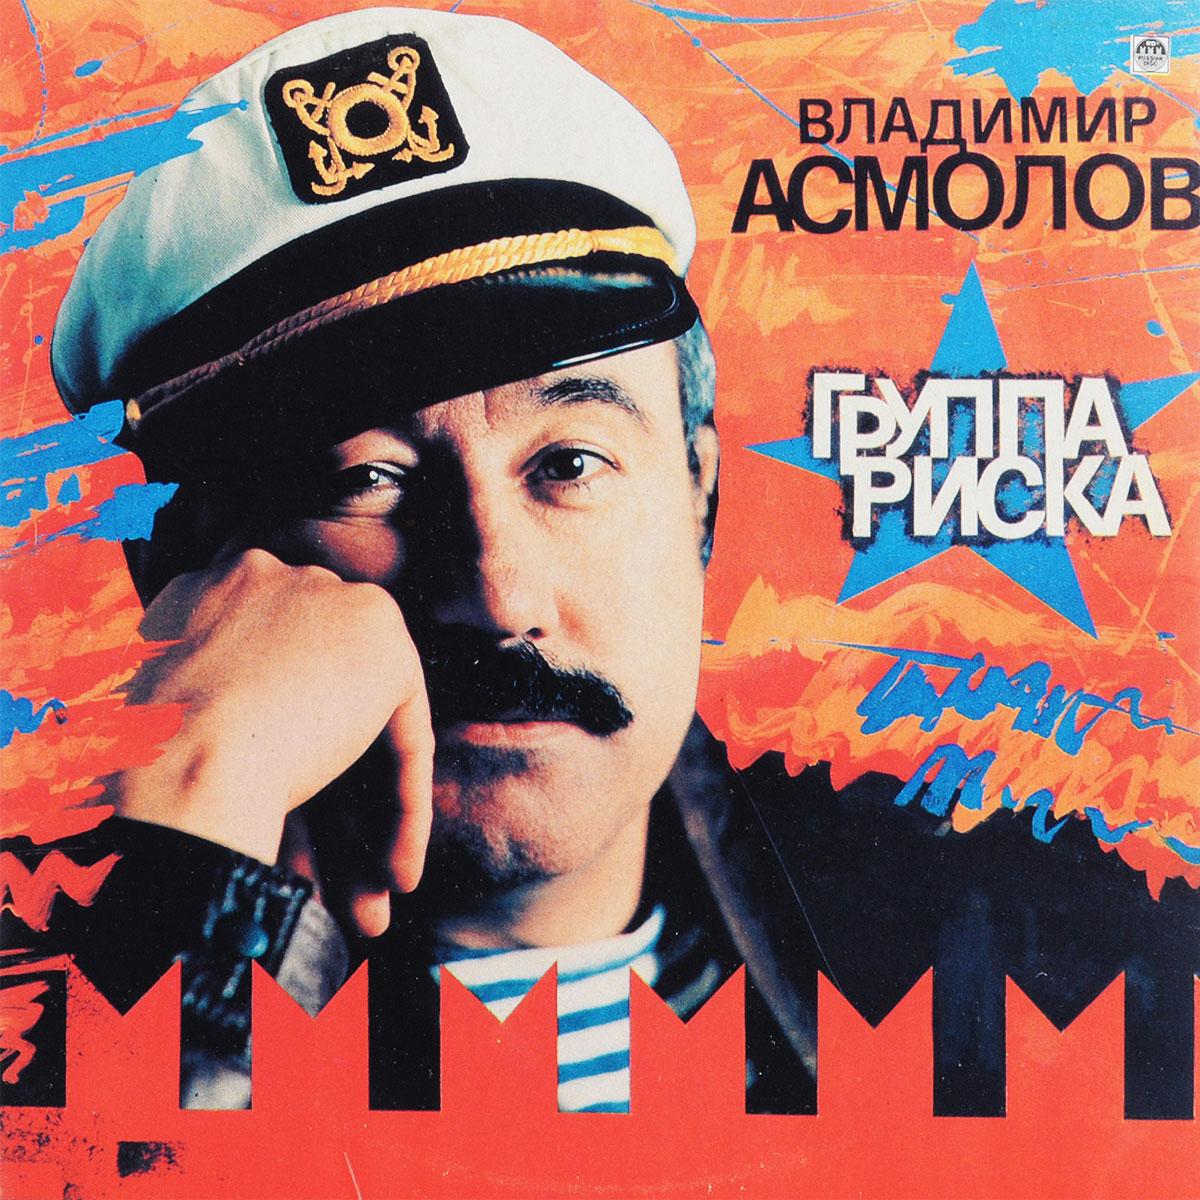 Zakazat.ru: Владимир Асмолов. Группа риска (LP)